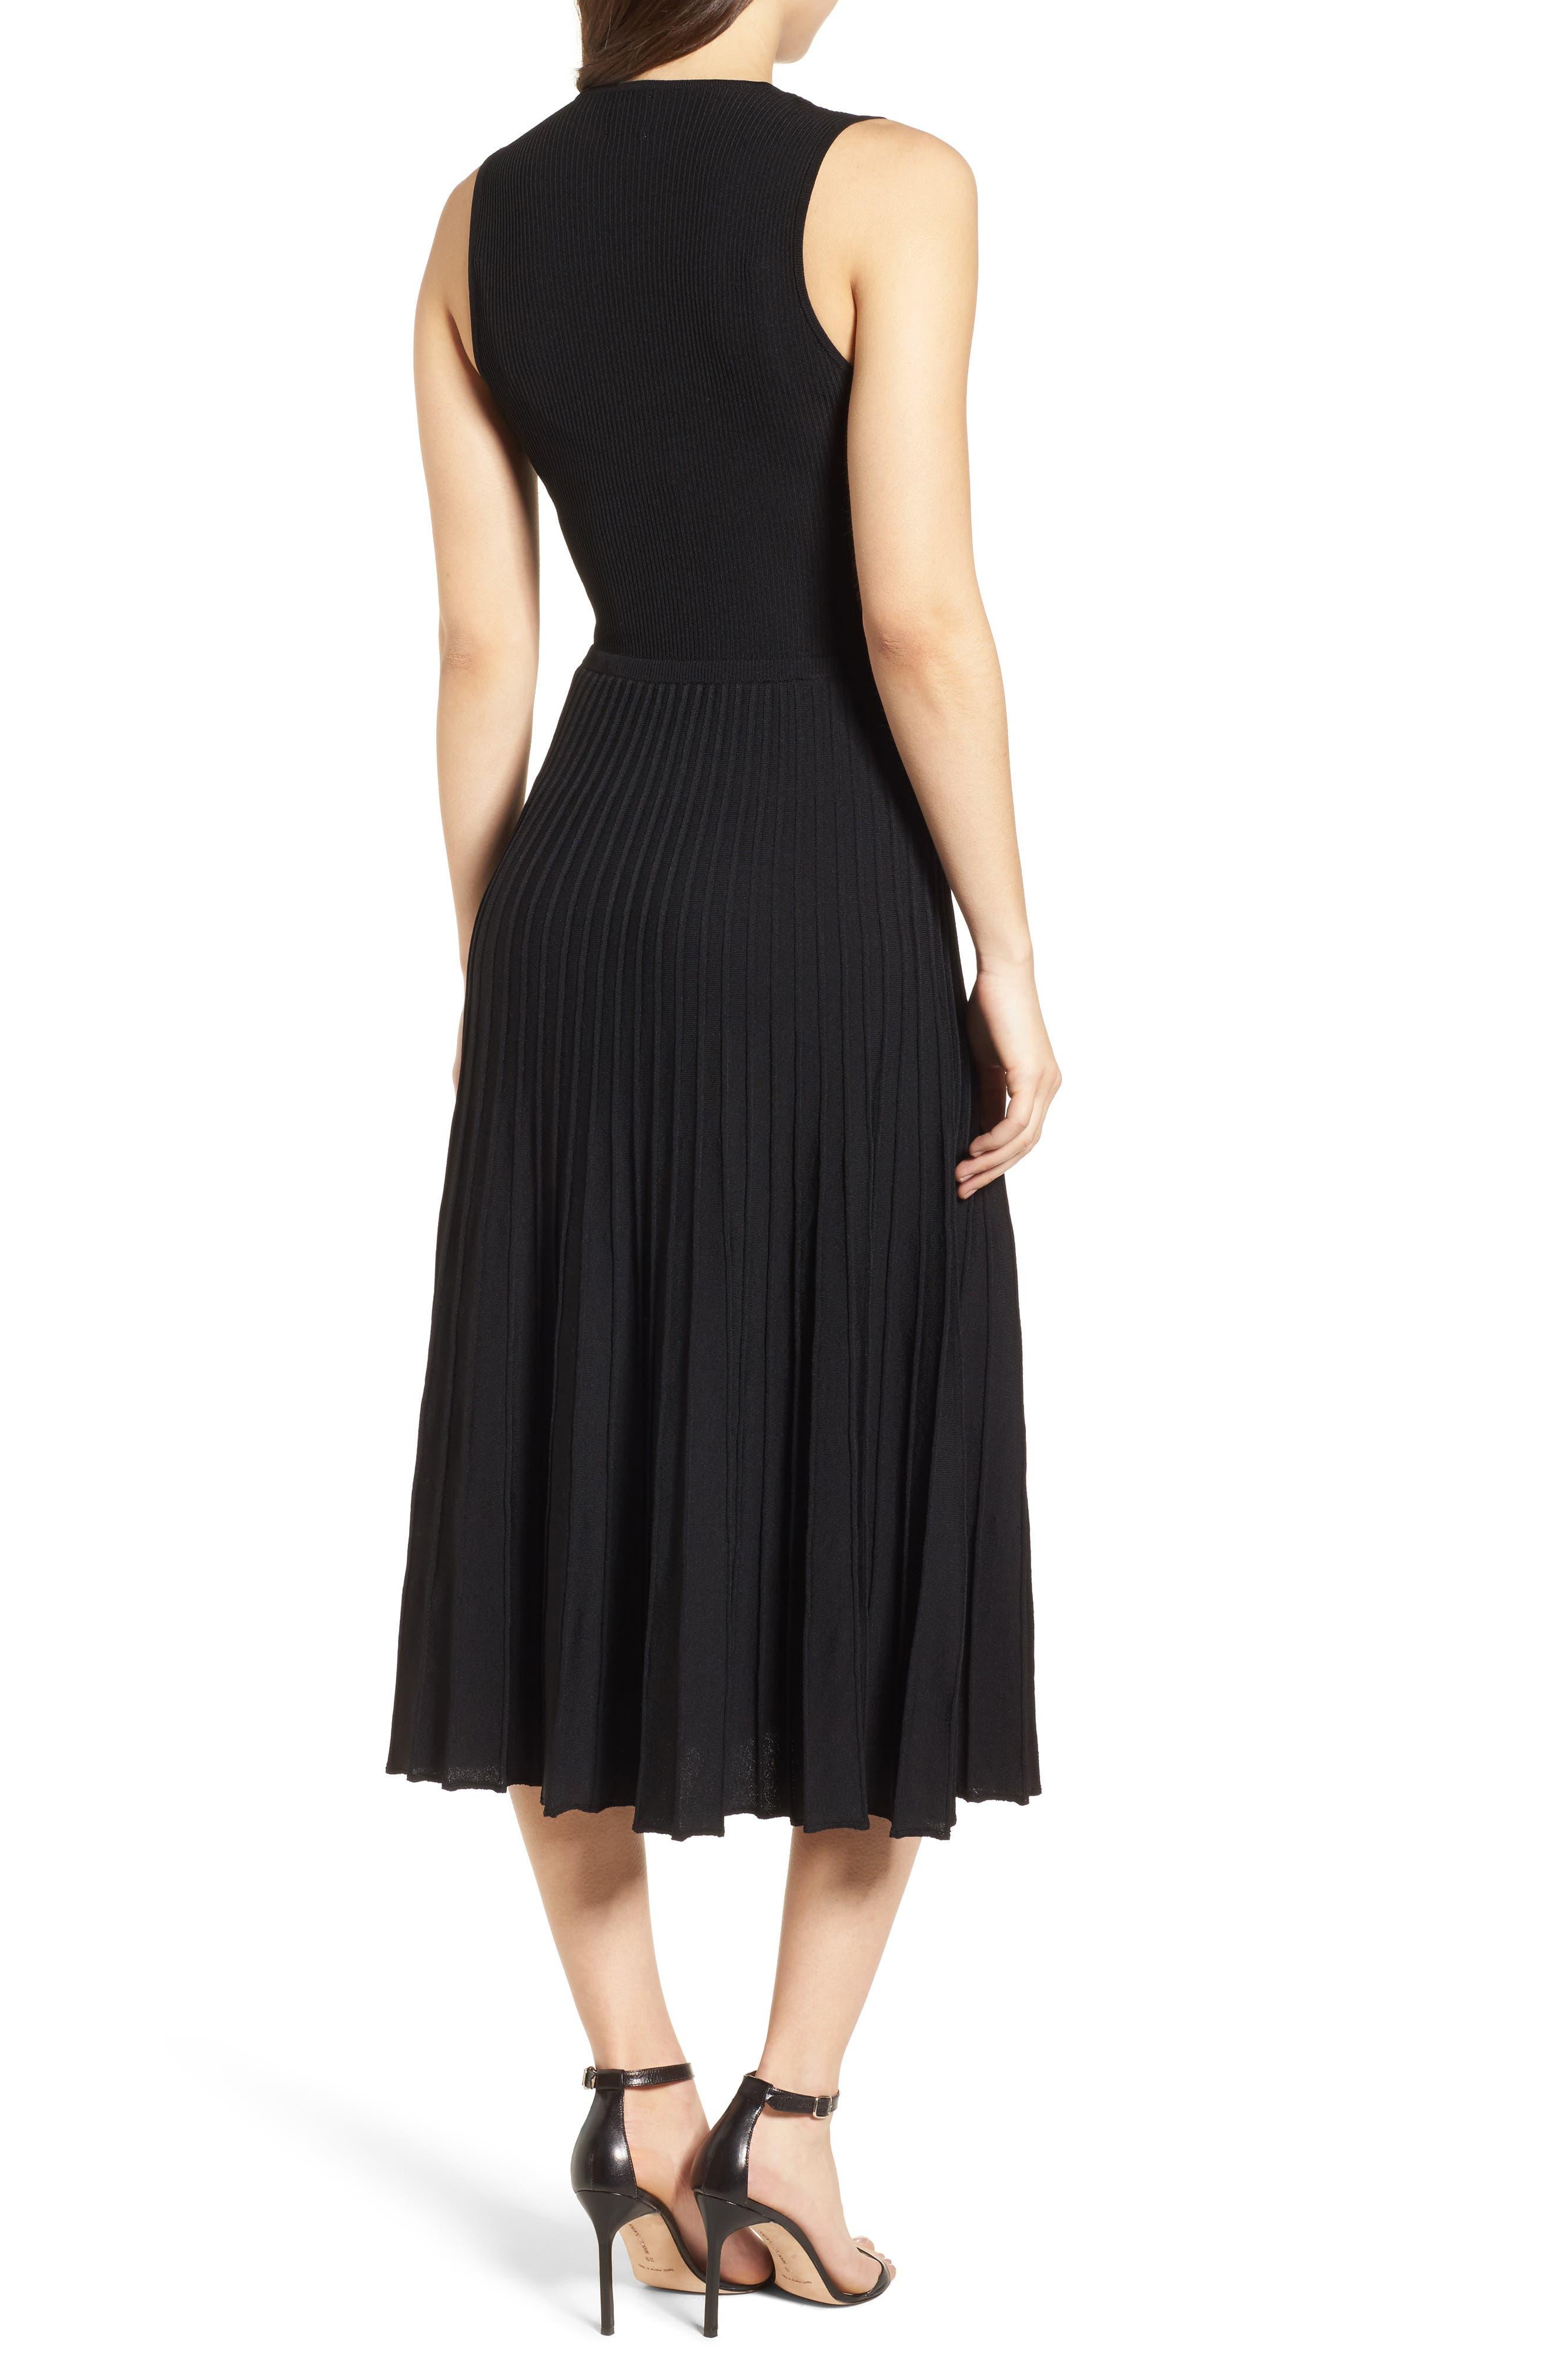 New York Pleated Sweater Midi Dress,                             Alternate thumbnail 2, color,                             Black